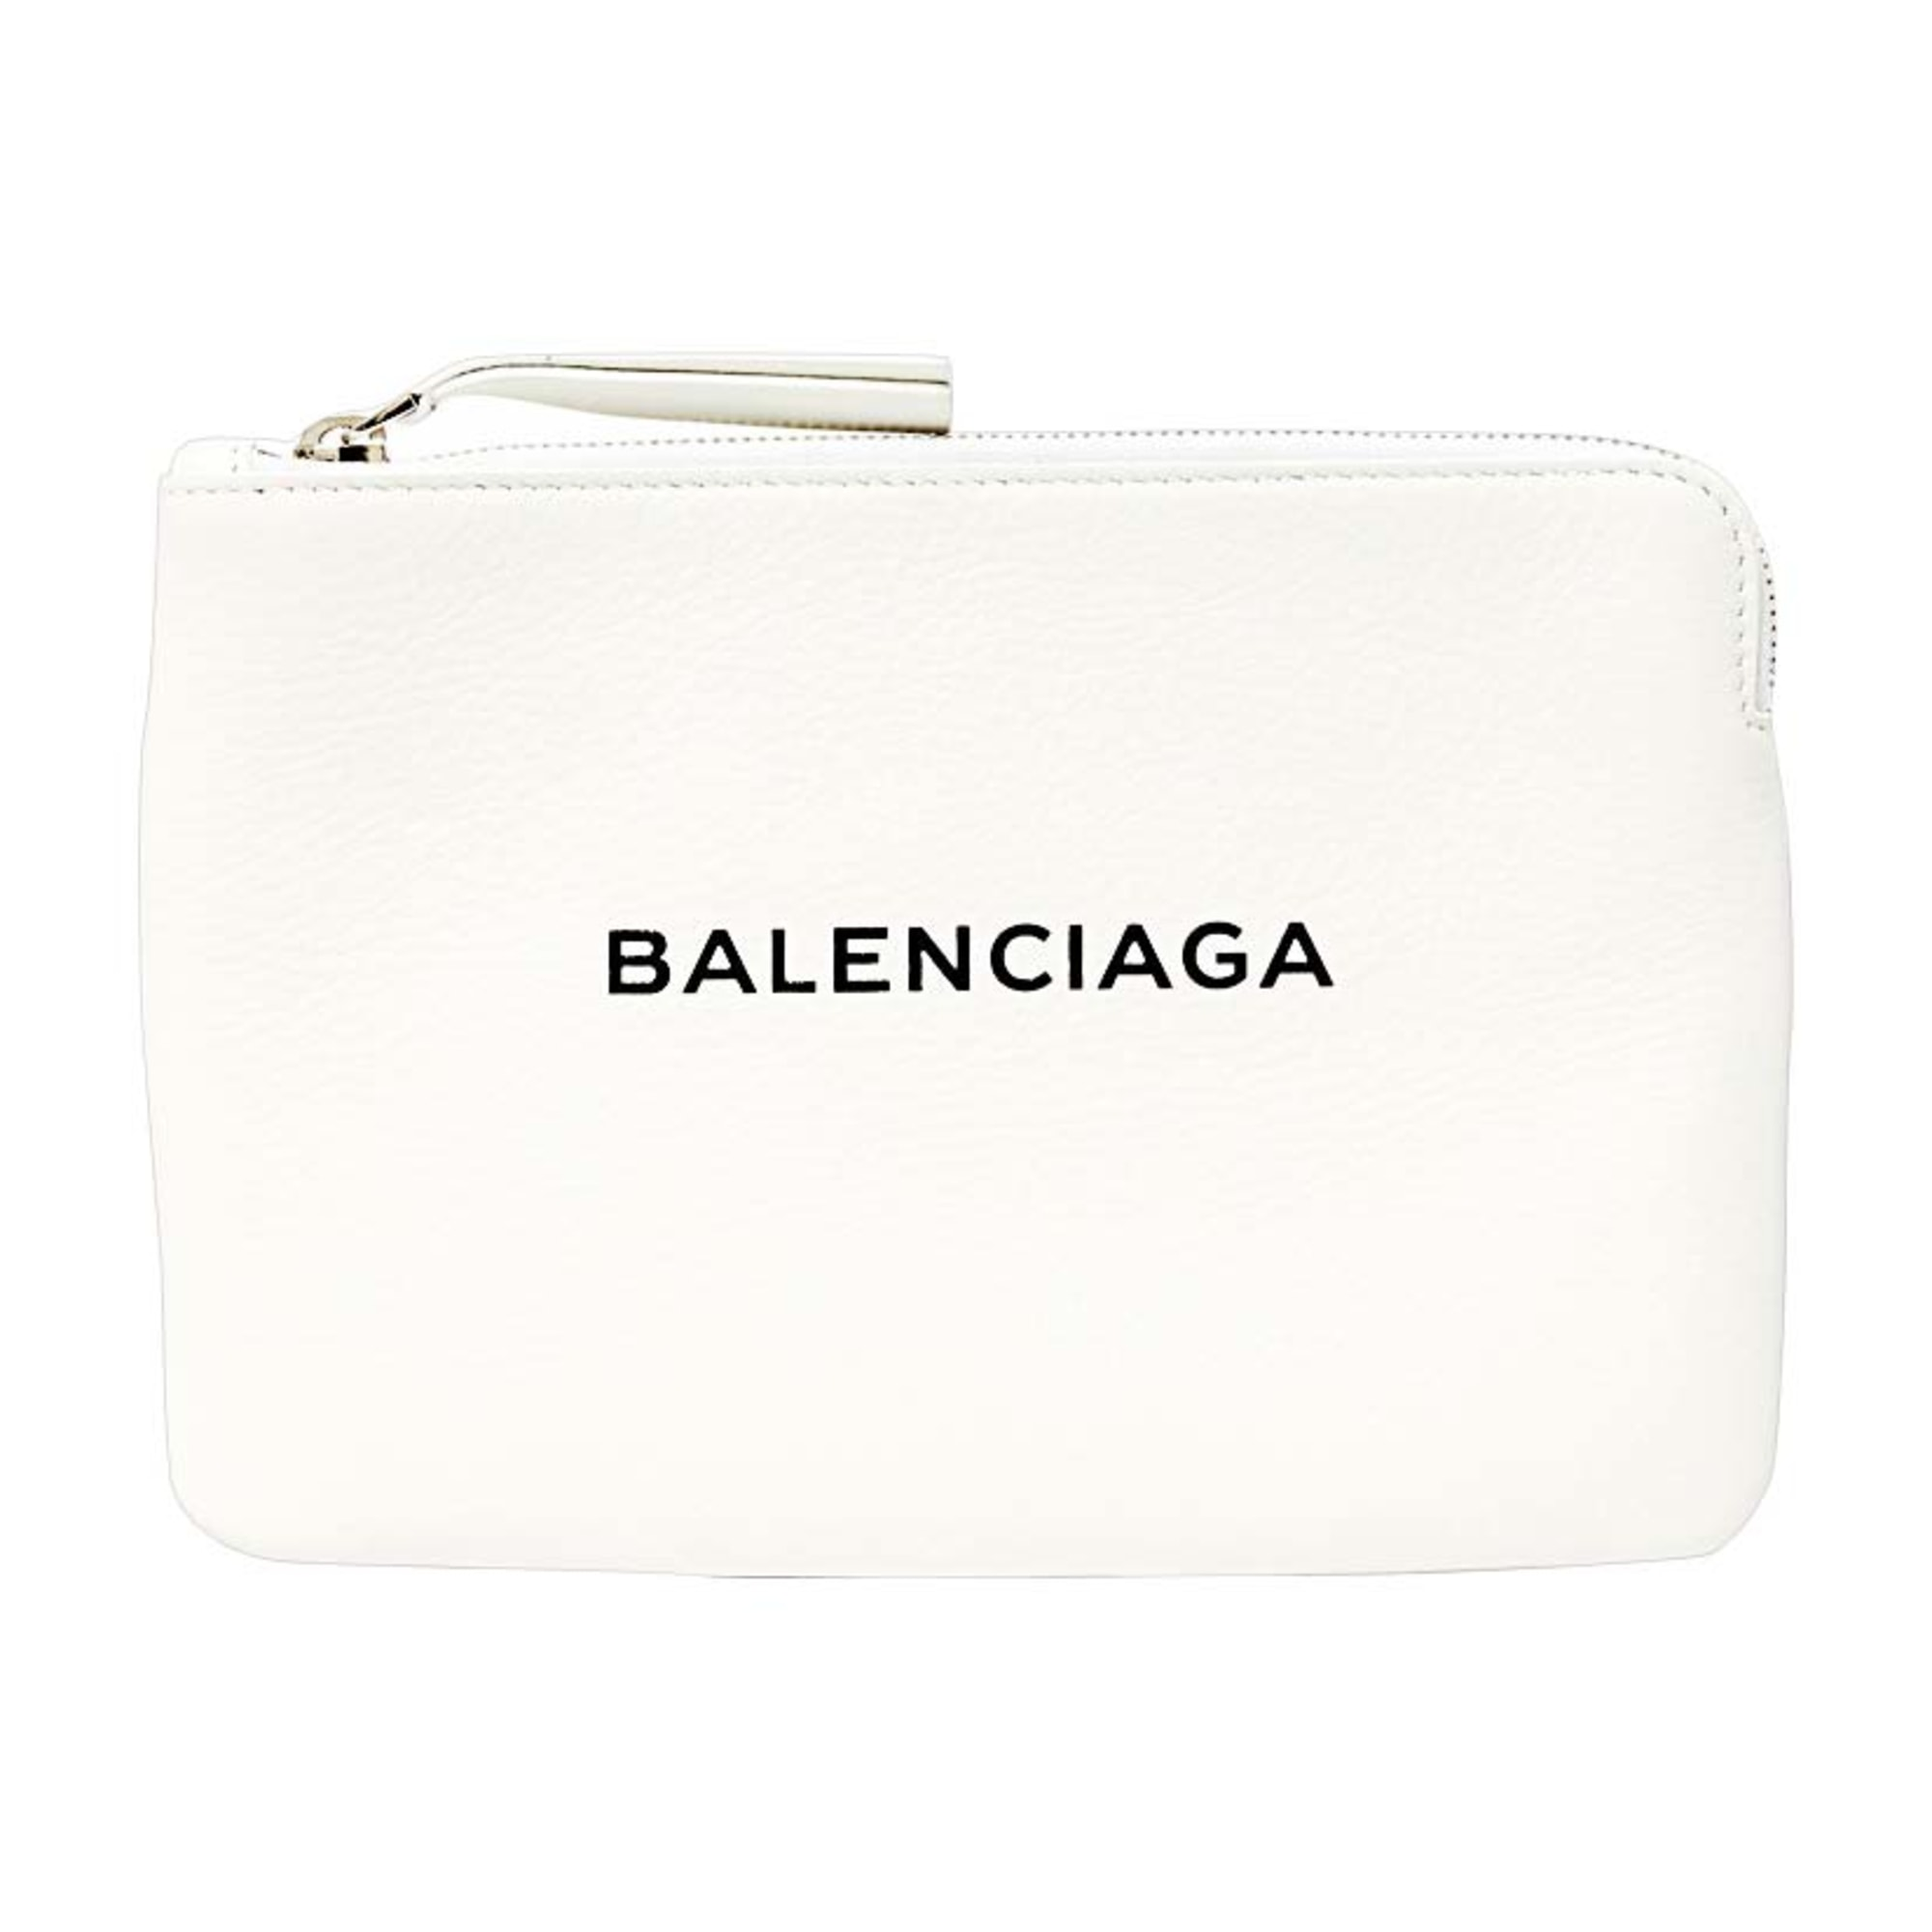 Leather Clutch BALENCIAGA White, off-white, ecru